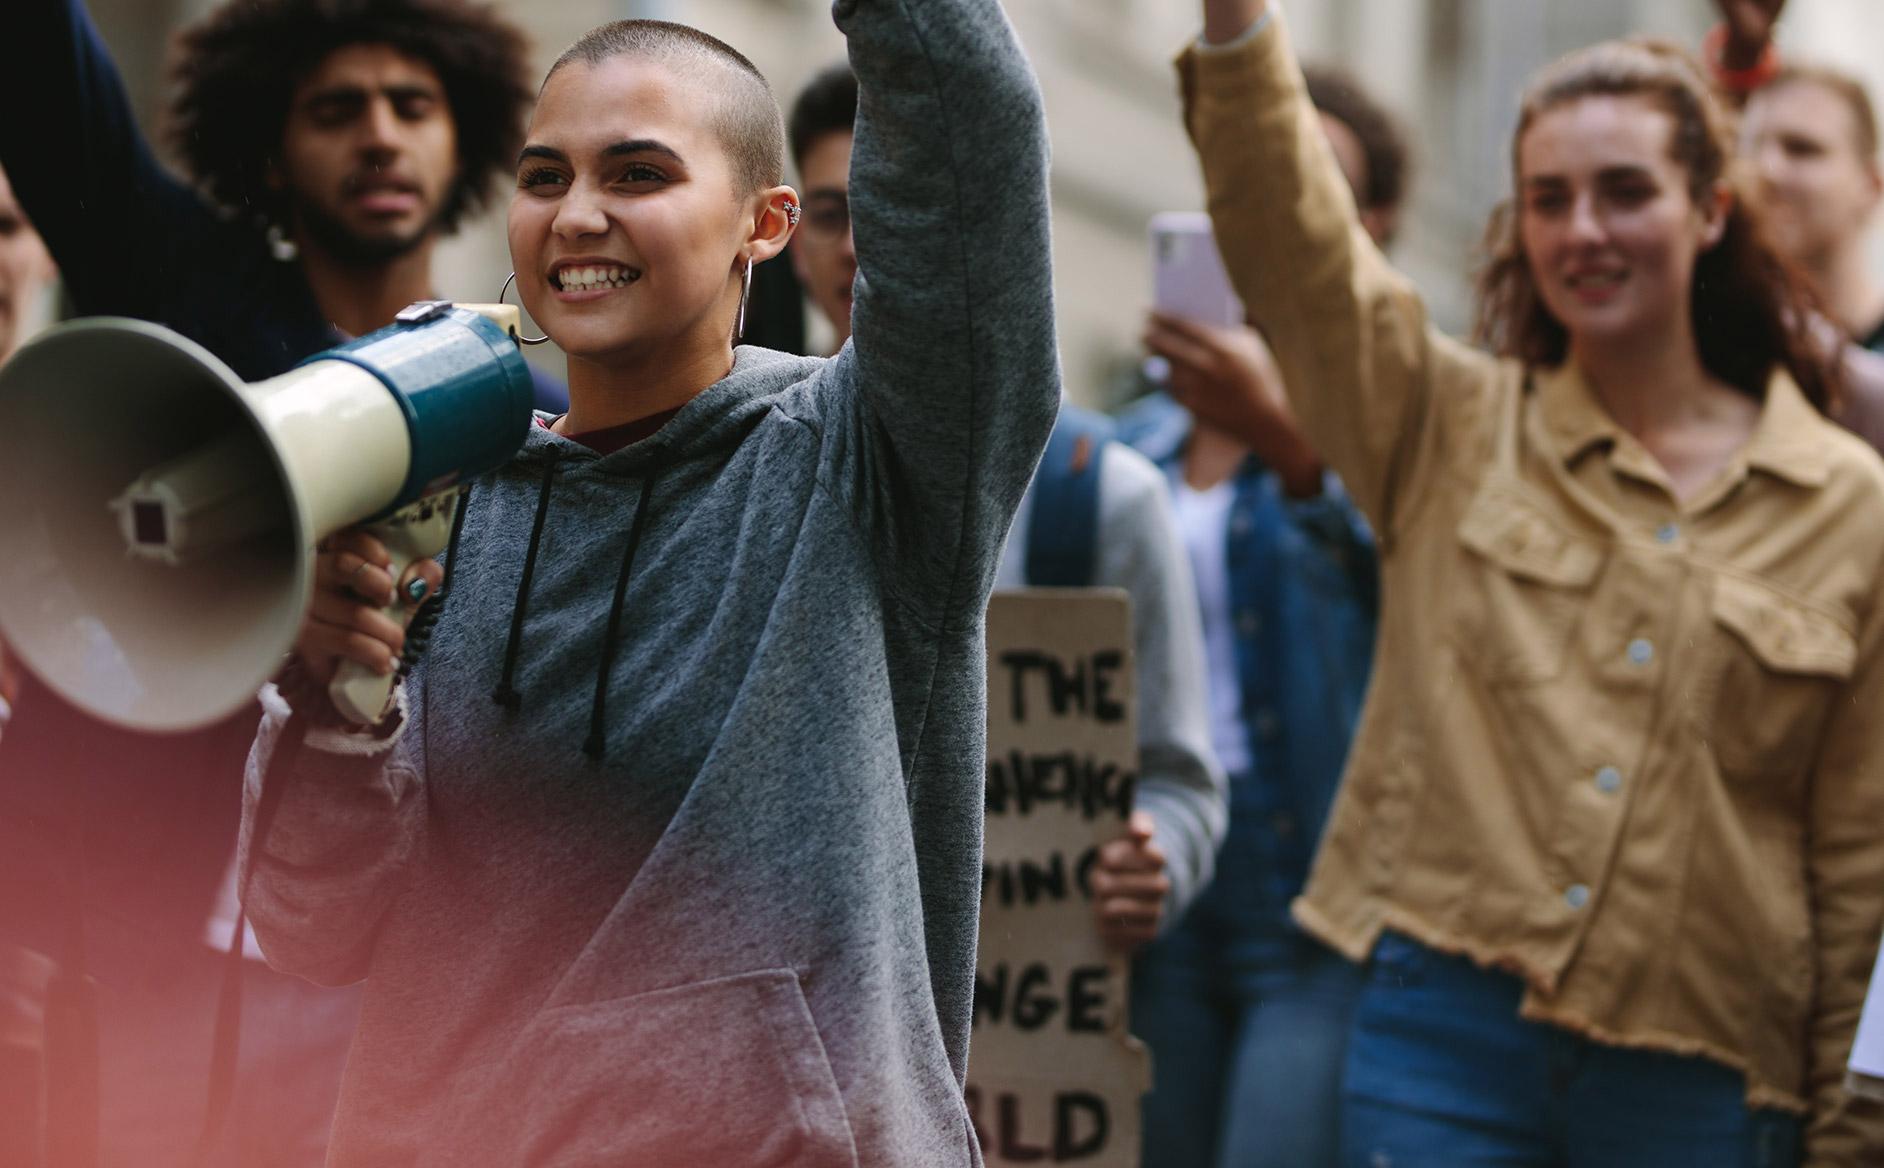 Students deserve better